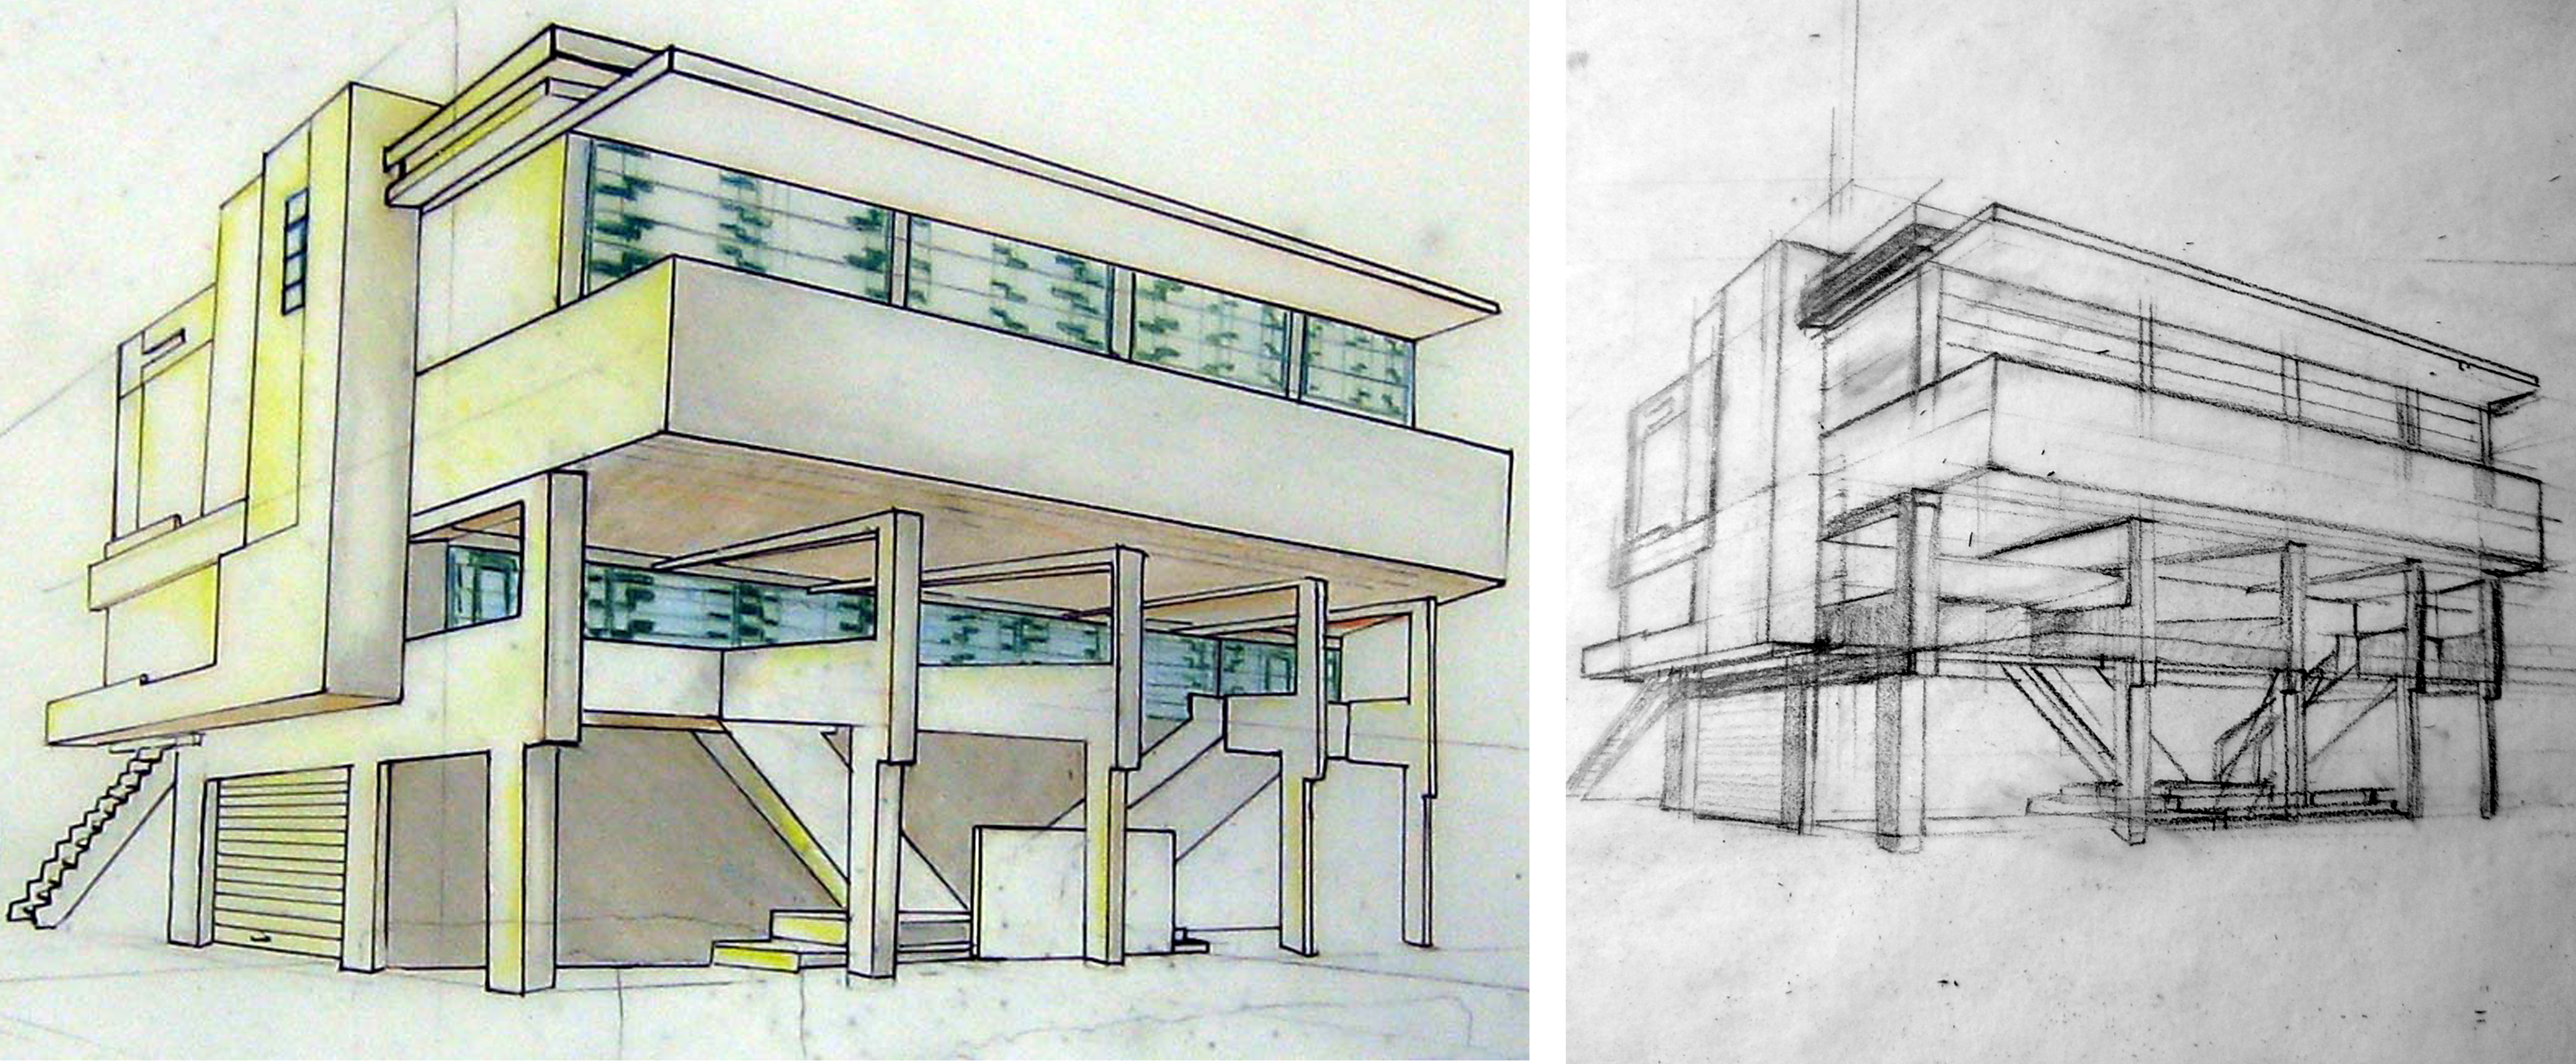 5100x2106 beach house drawing - Beach House Drawings